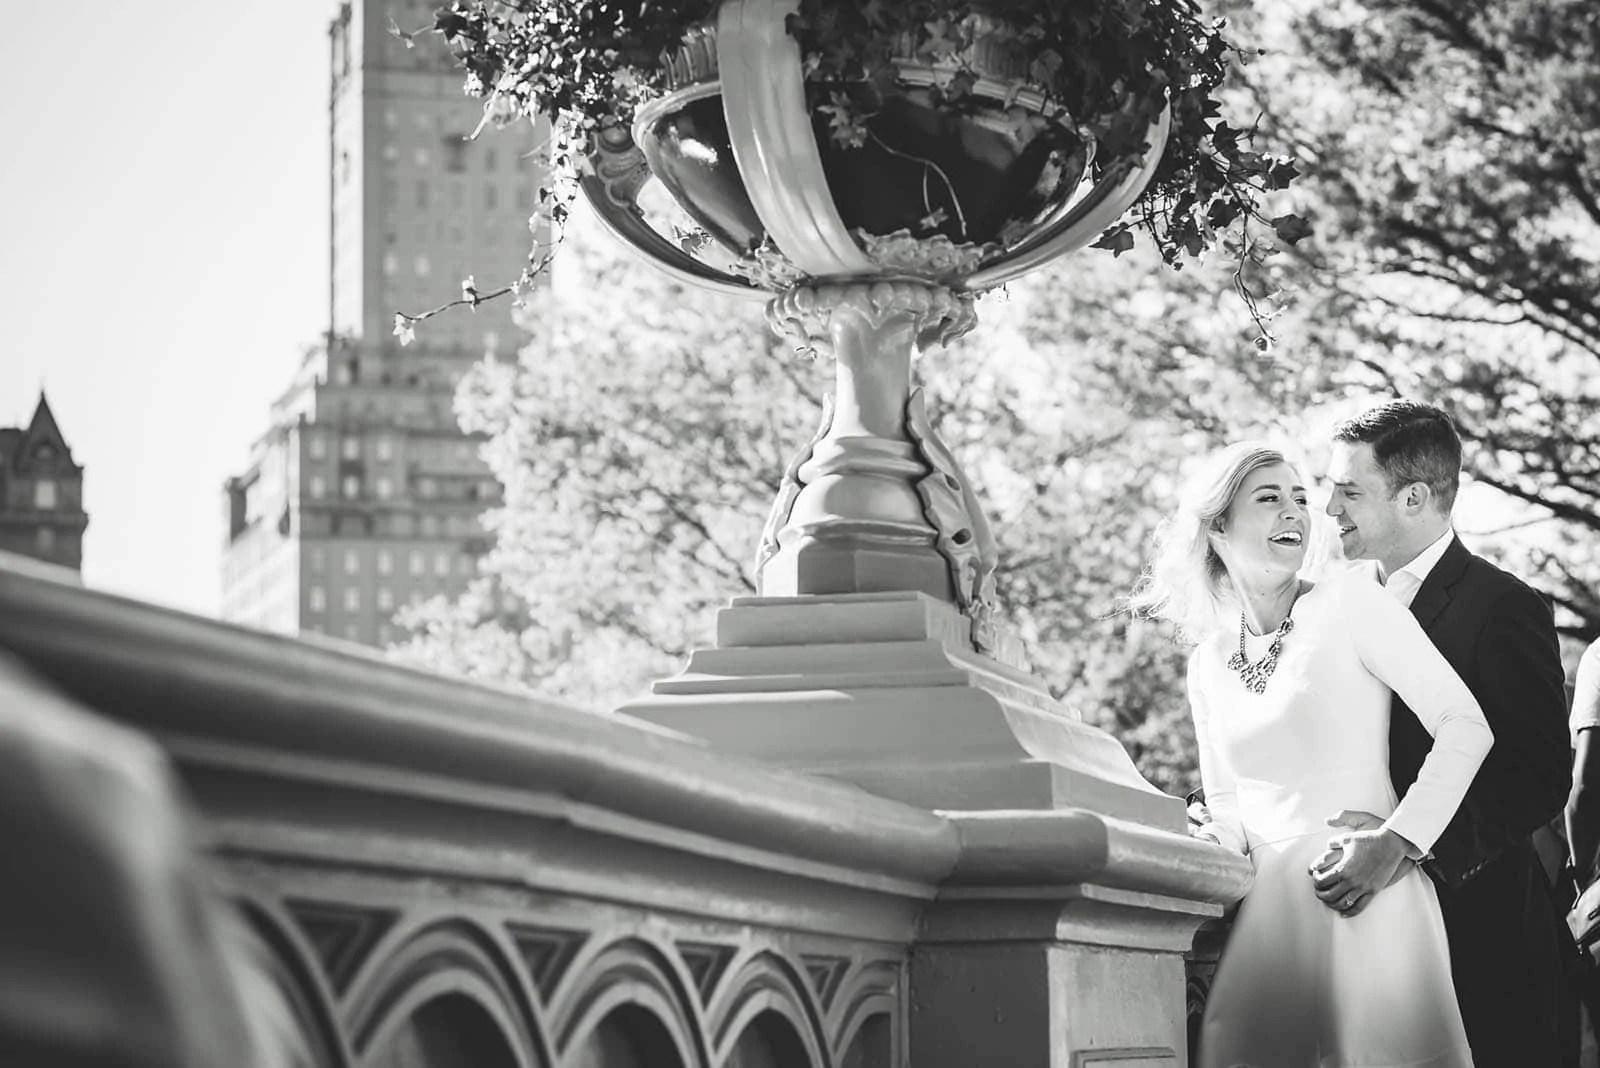 Central Park Playful Engagement Poses